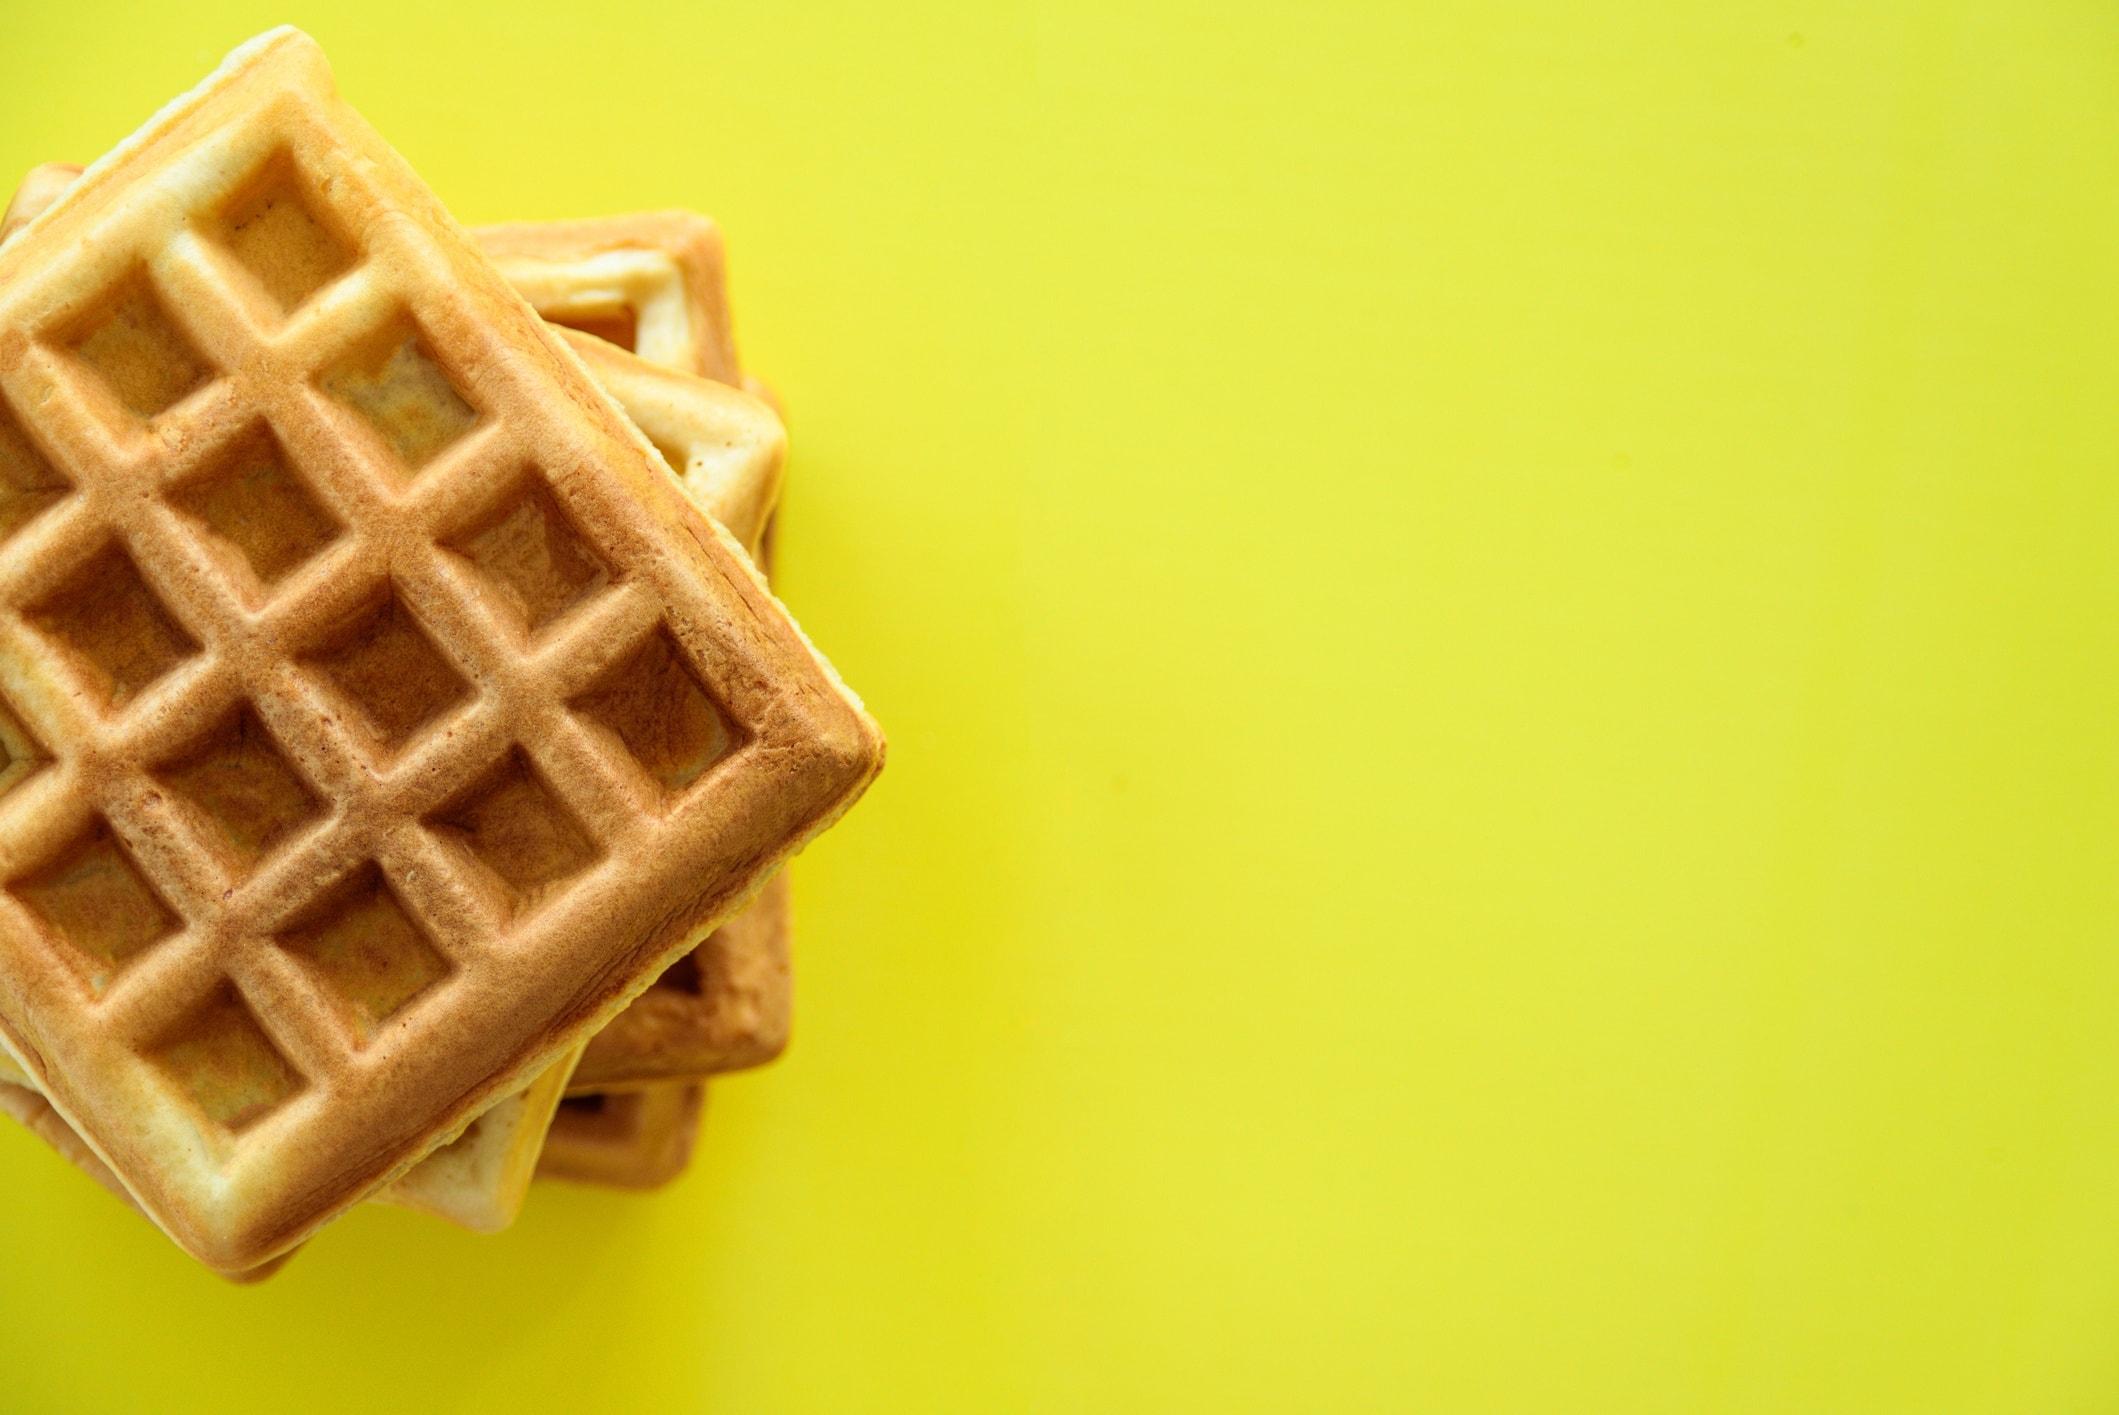 waffles on yellow background